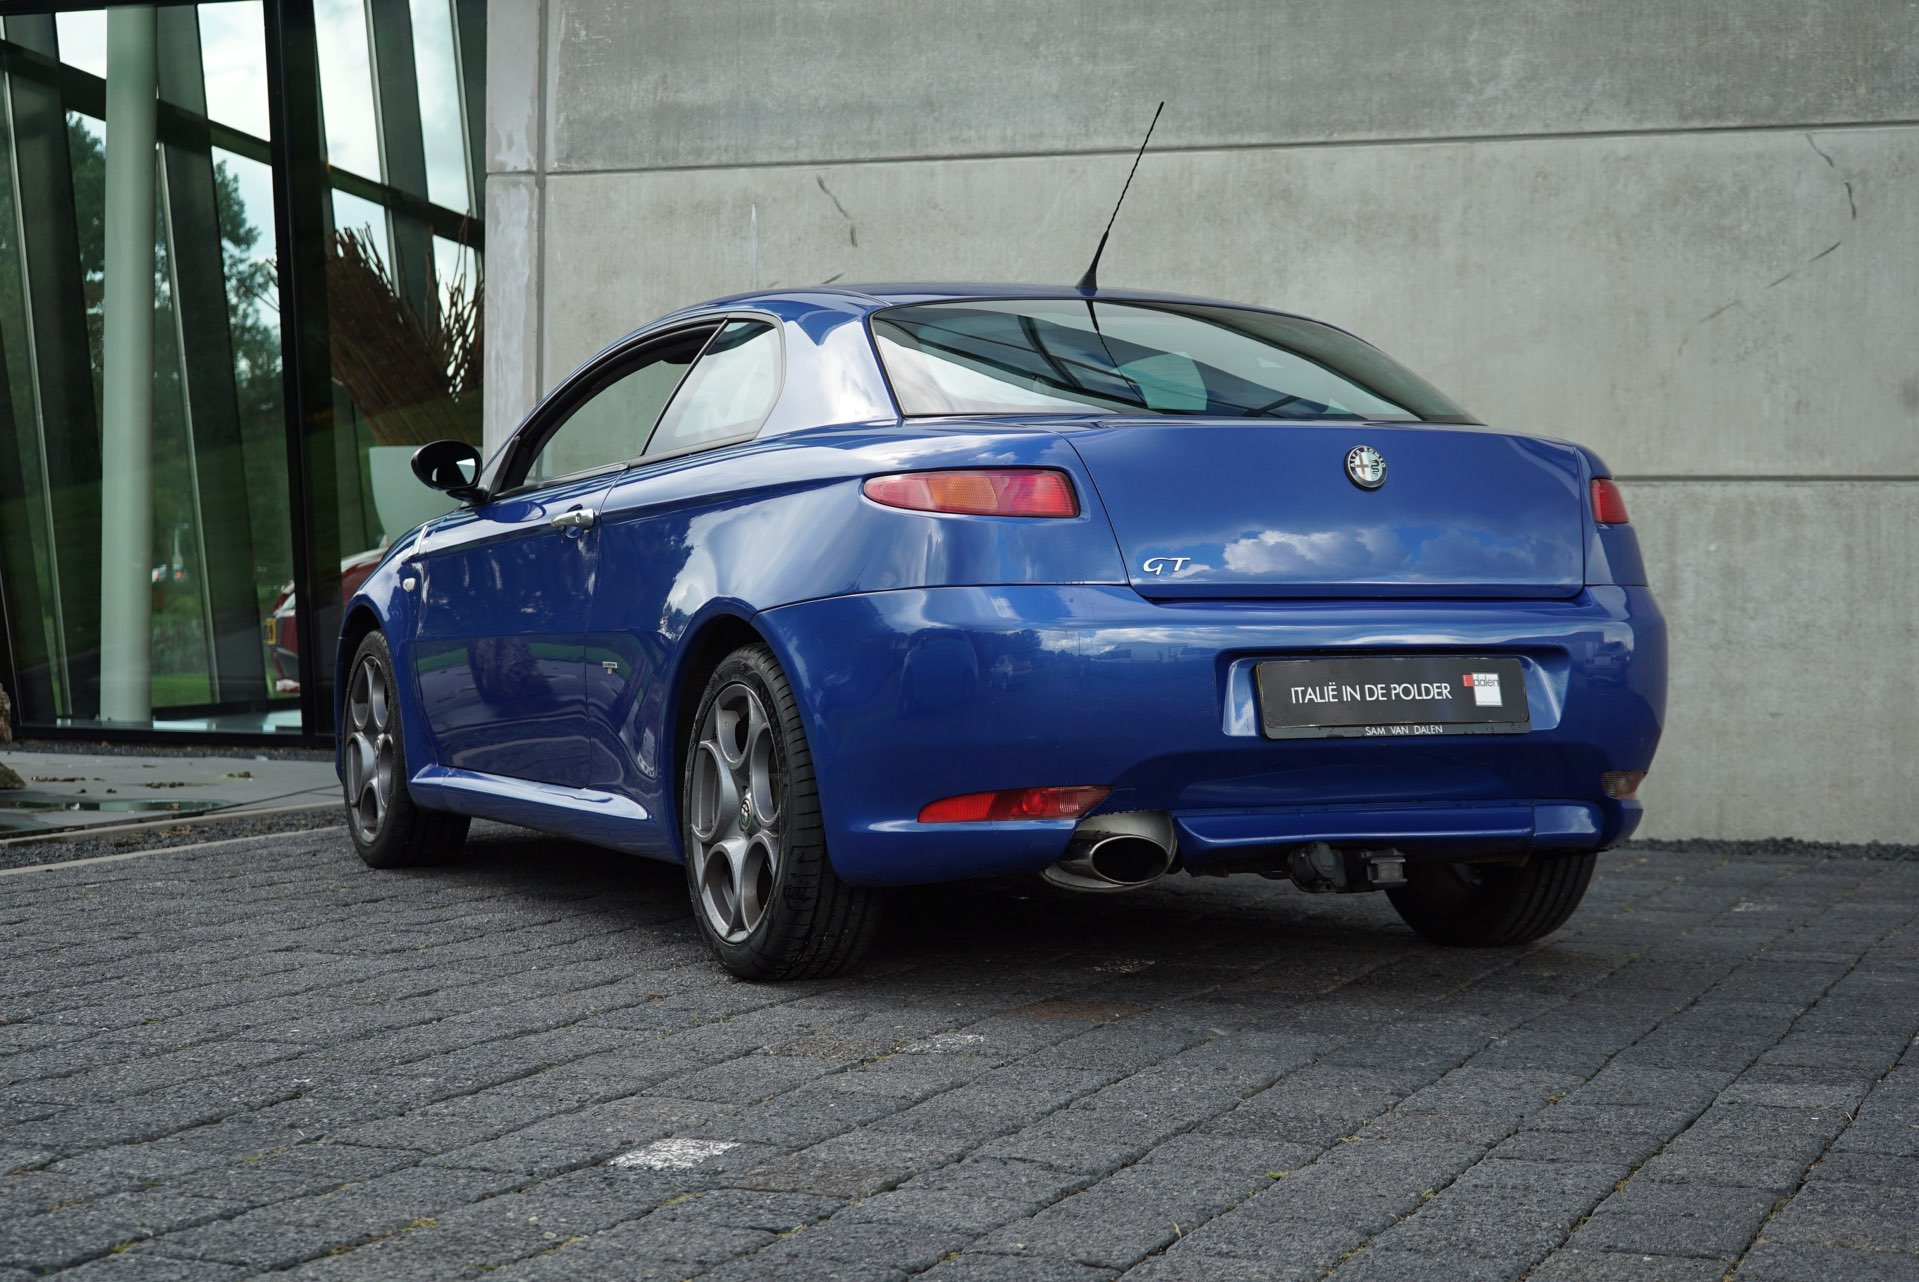 ALFA ROMEO GT 2.0 SPORT